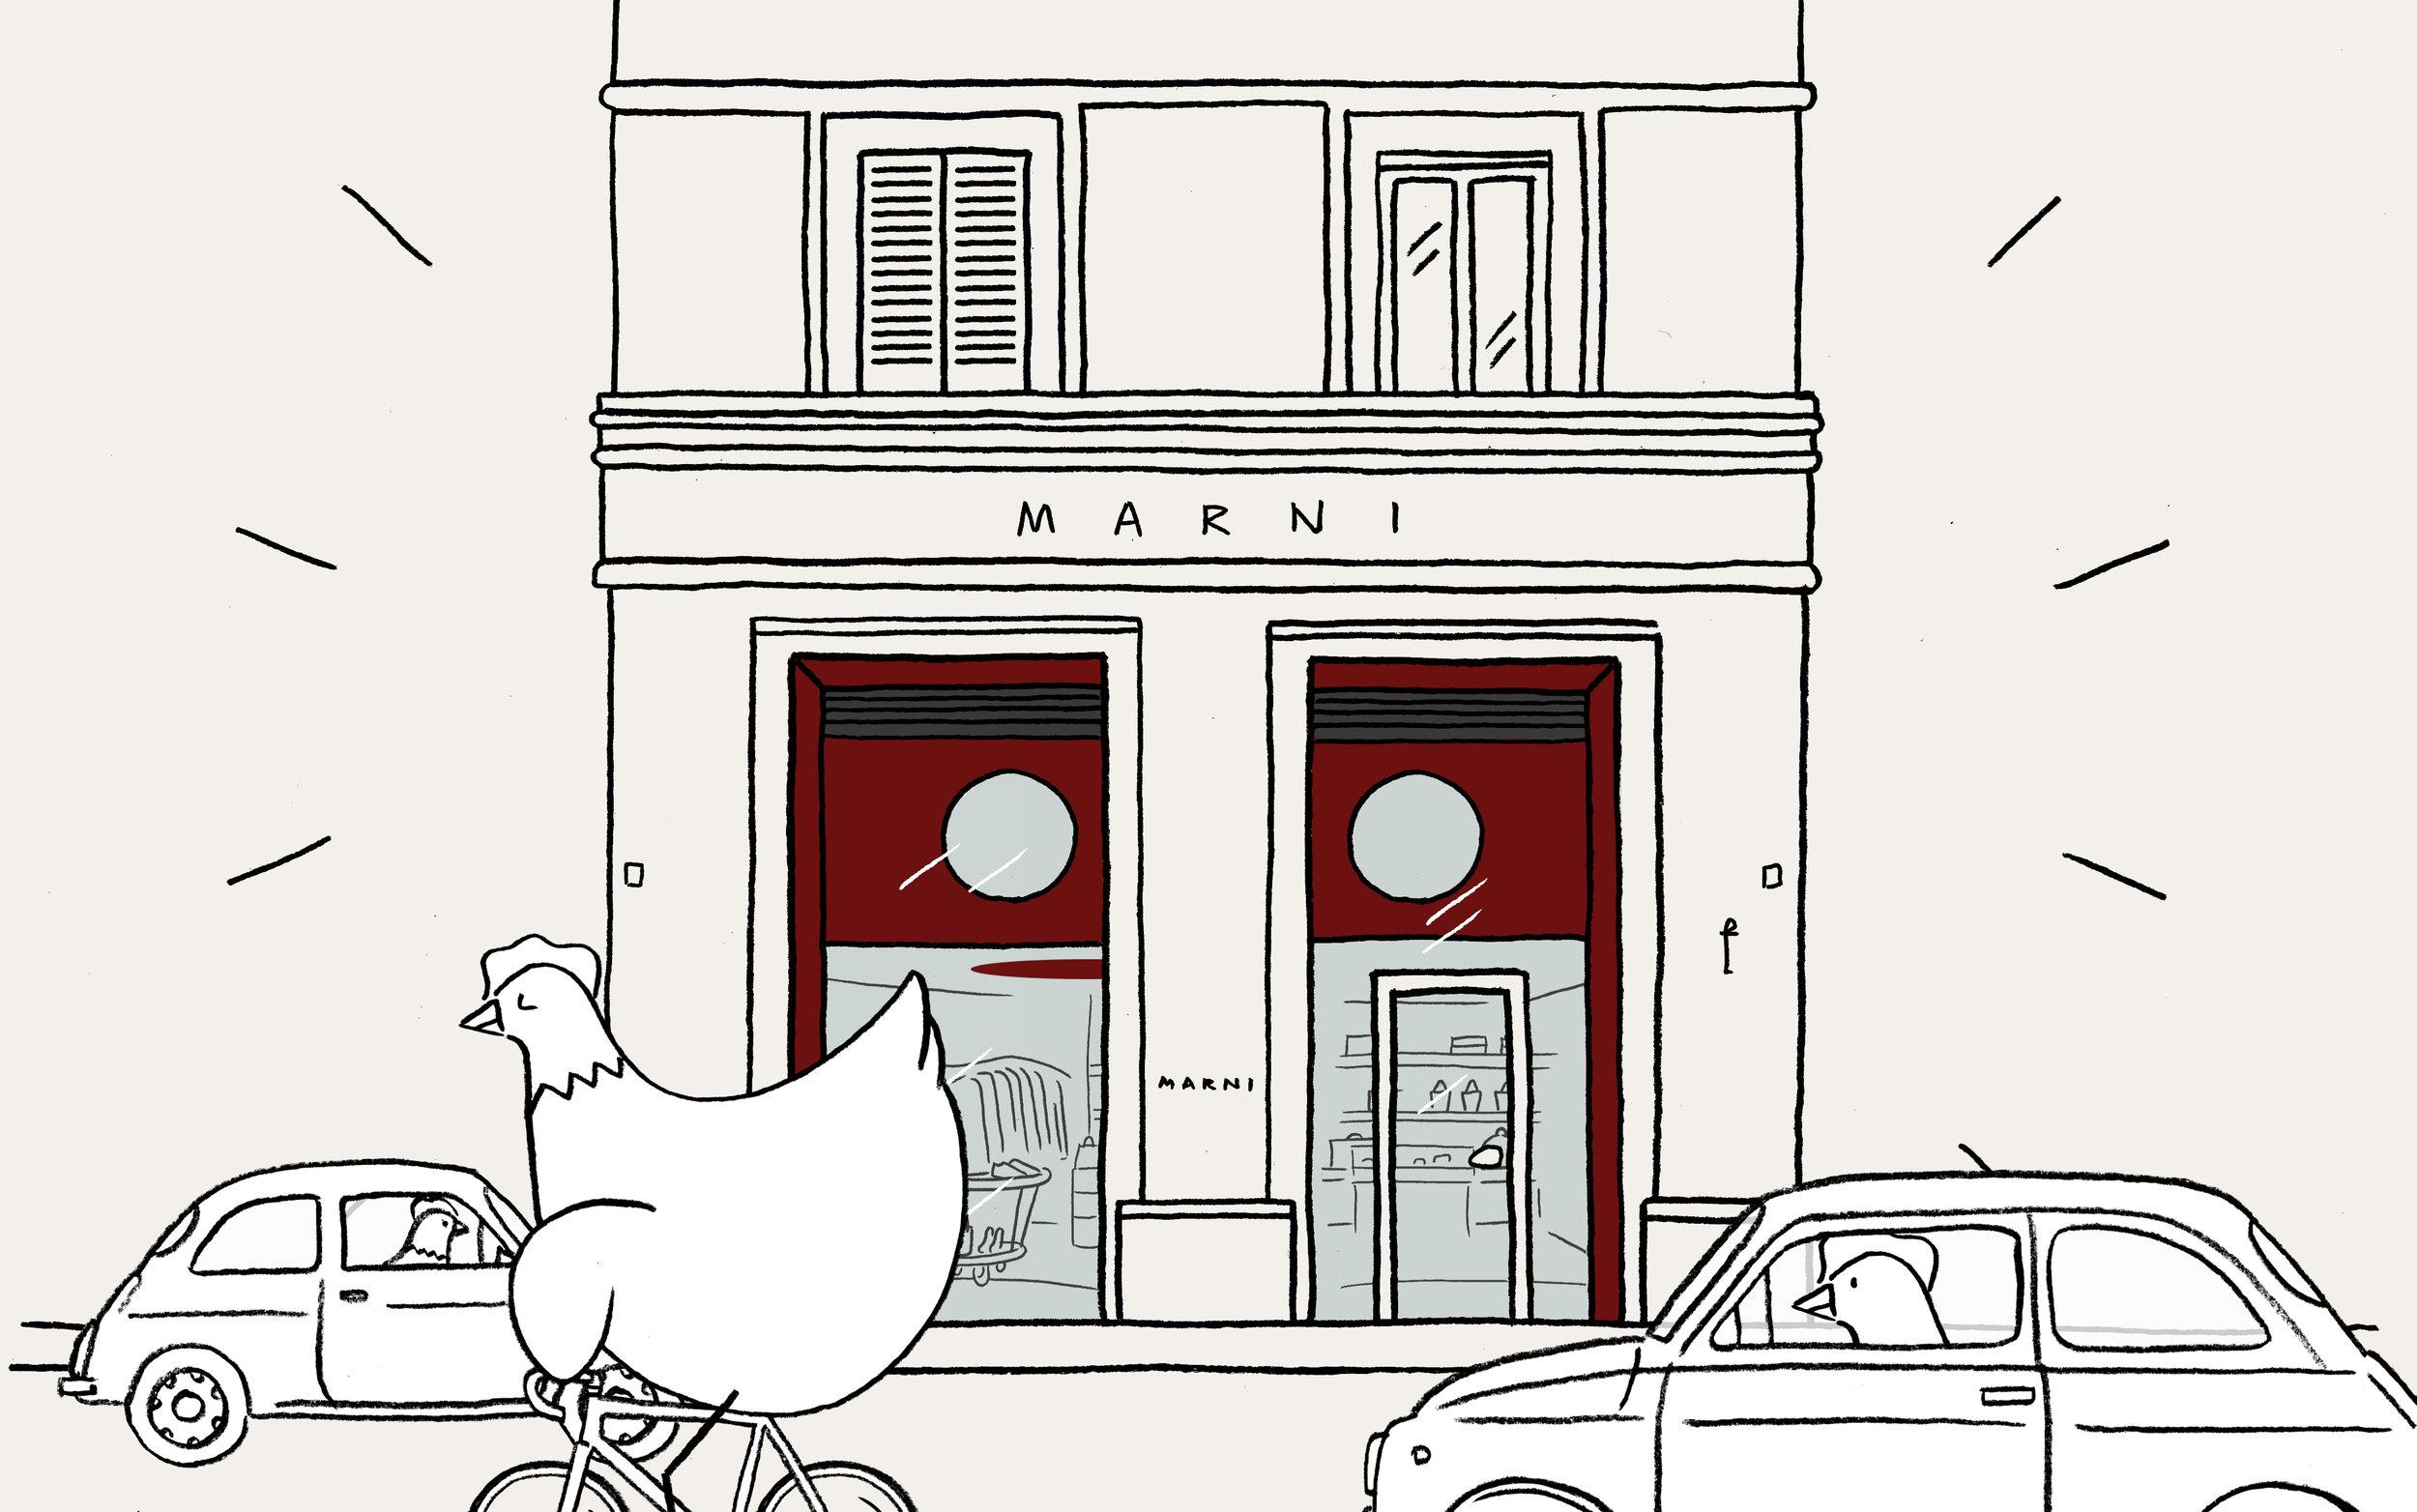 Marni Animation_Part_03_Final.jpg